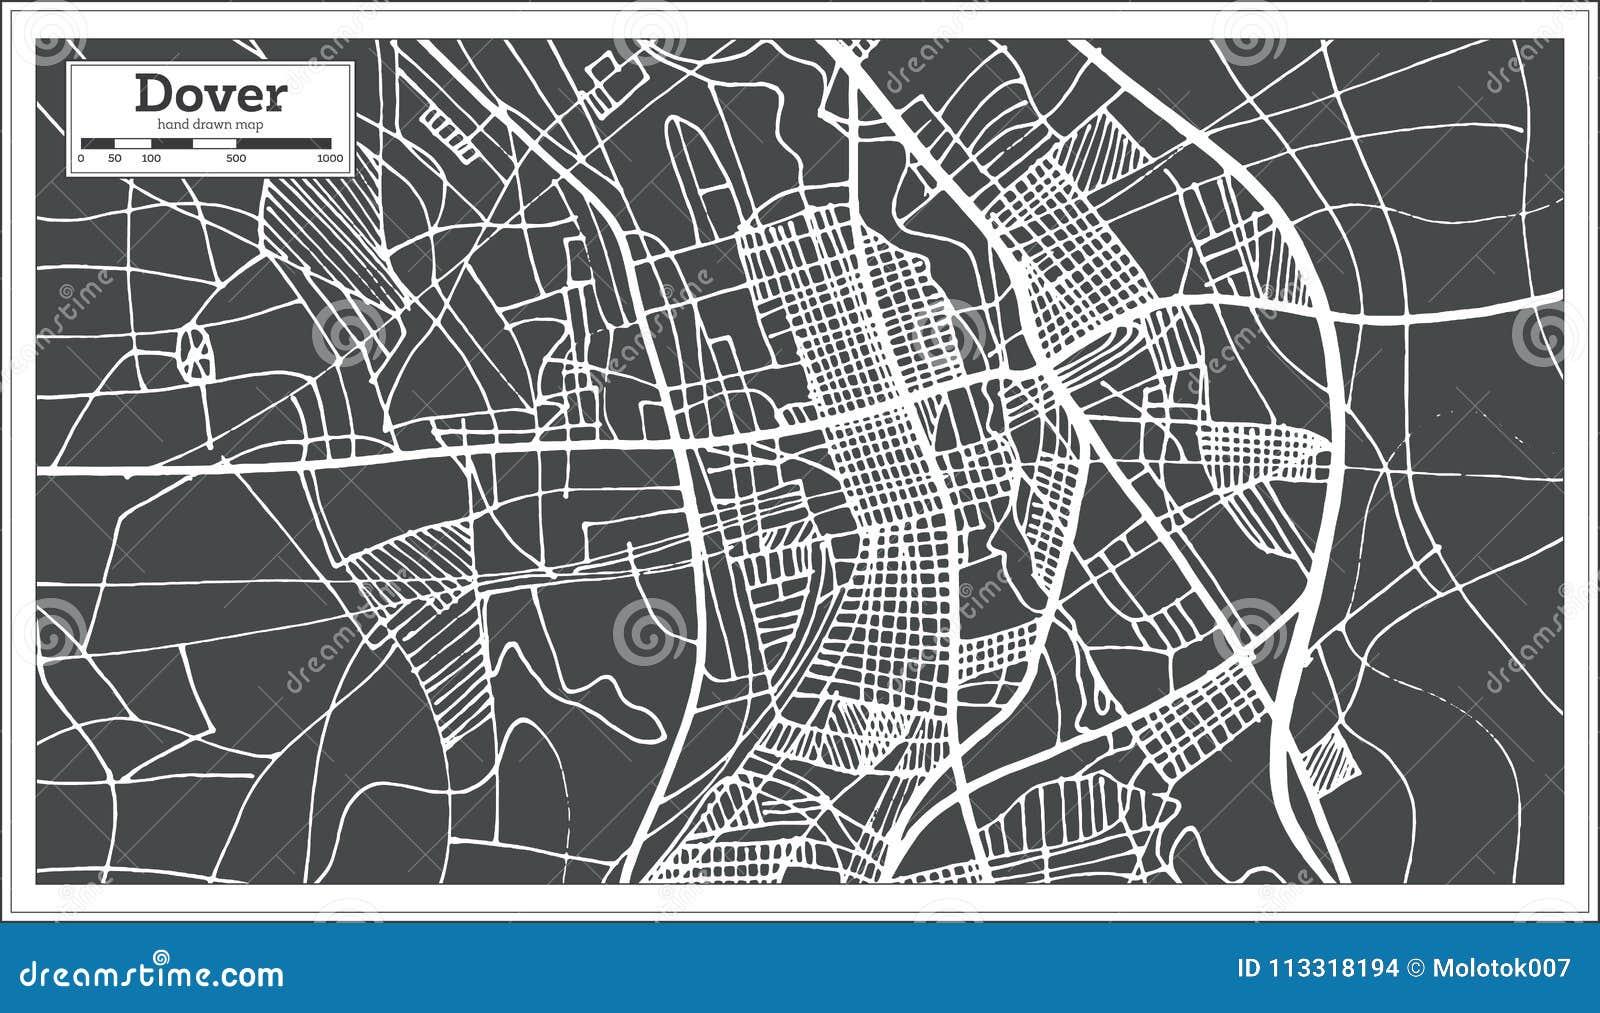 Dover De Zip Code Map.Dover Delaware Usa City Map In Retro Style Outline Map Stock